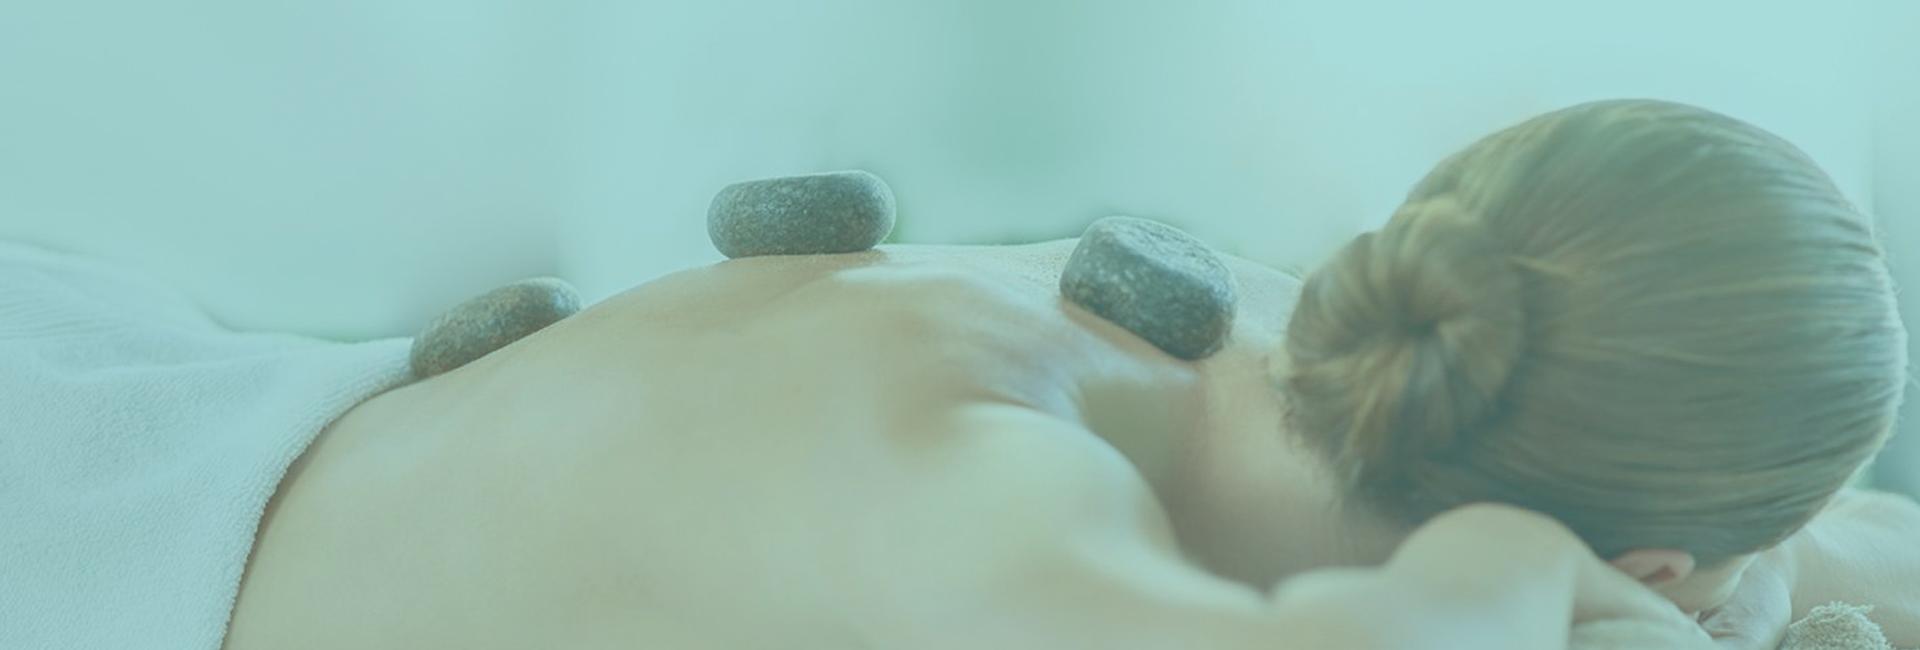 Caress Wellness & Day Spa